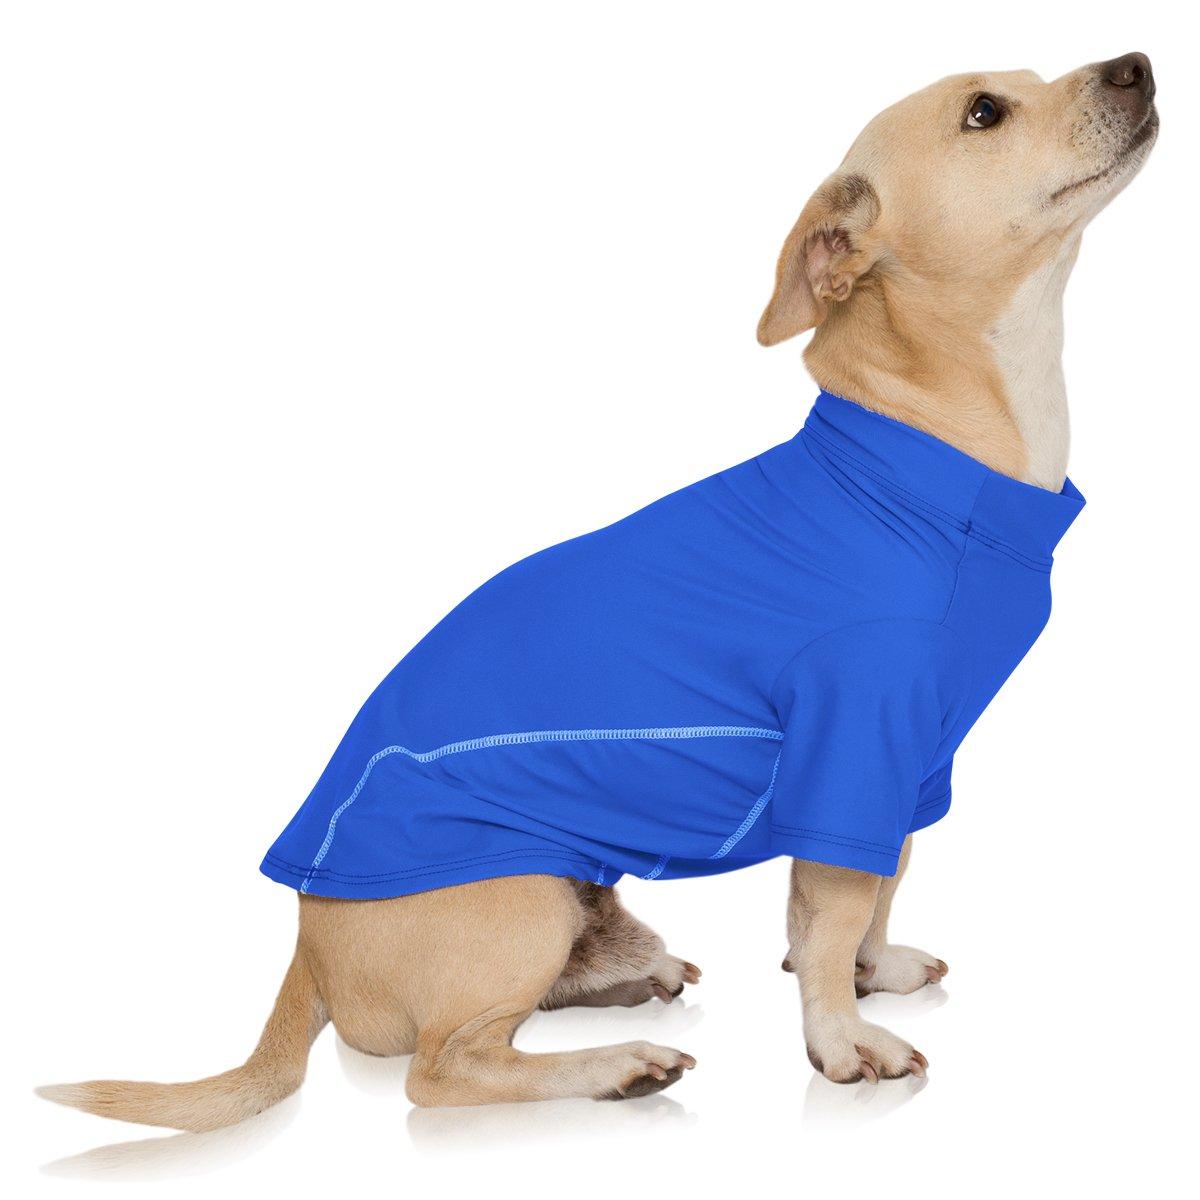 PlayaPup Pro Sun Protective/Lightweight Dog Shirts, Blue, 2XL by PlayaPup